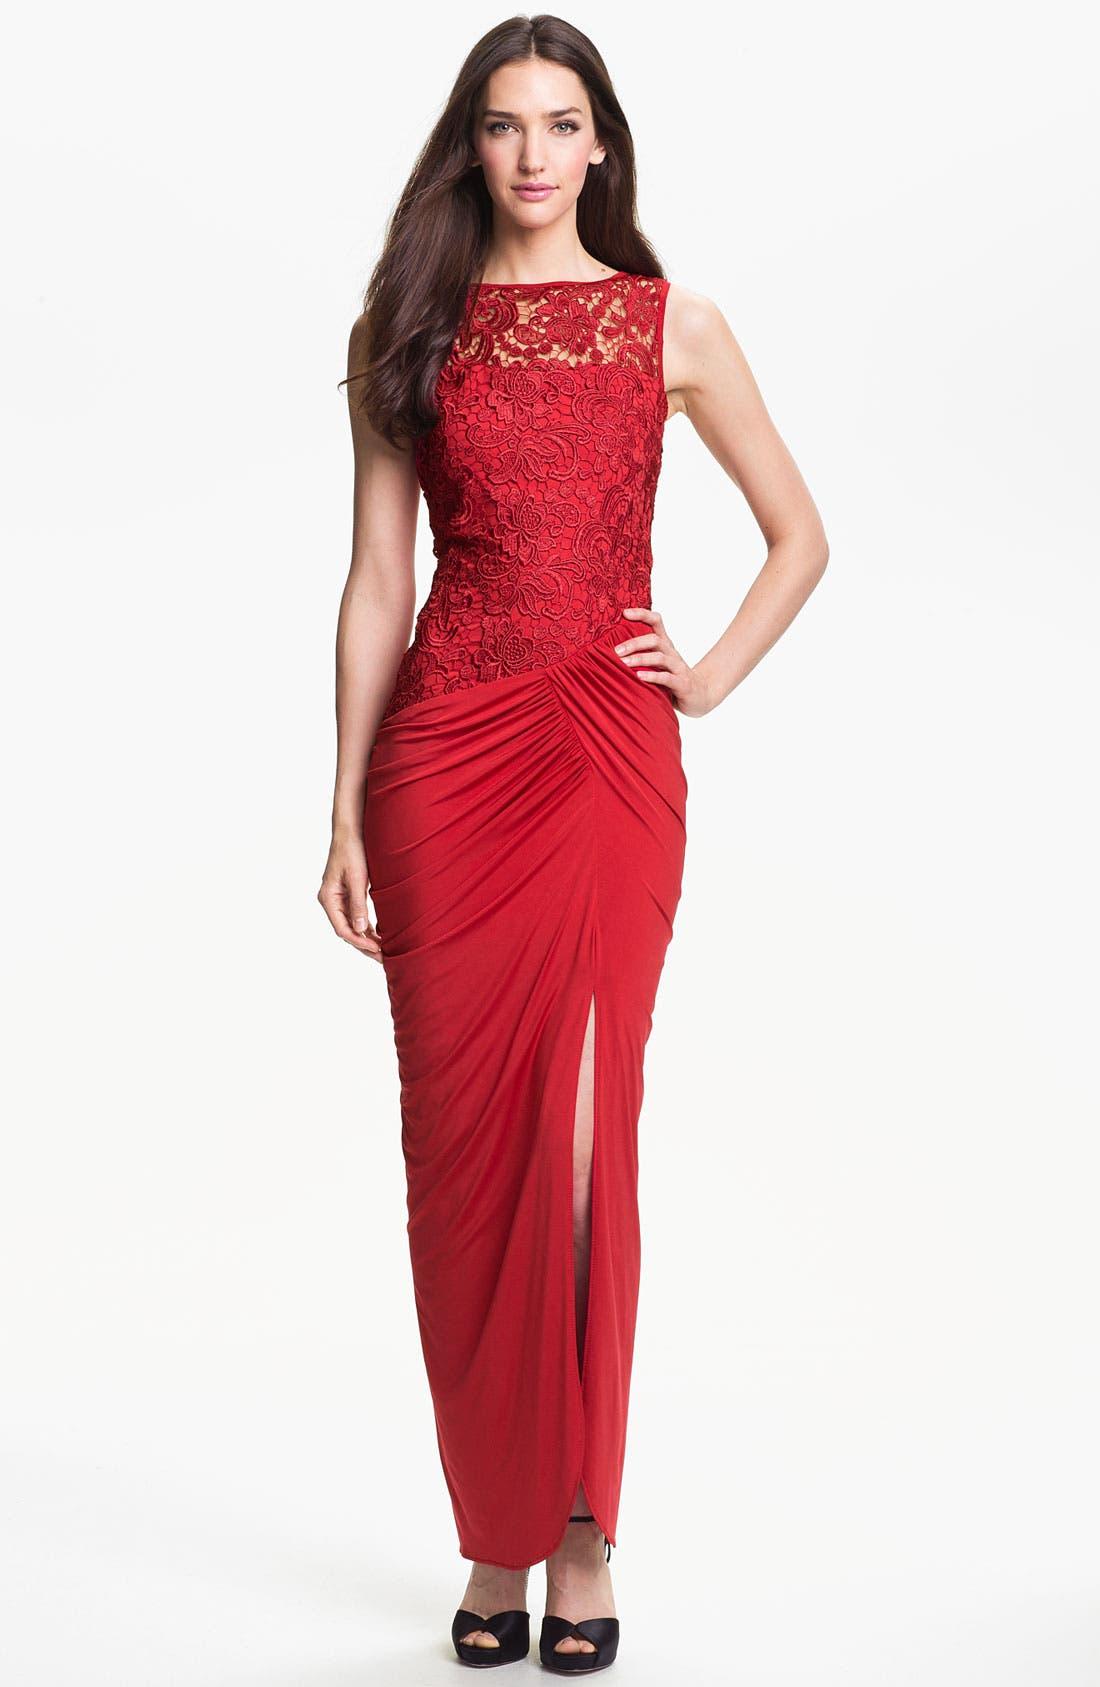 Main Image - Jessica McClintock Illusion Yoke Side Slit Jersey Gown